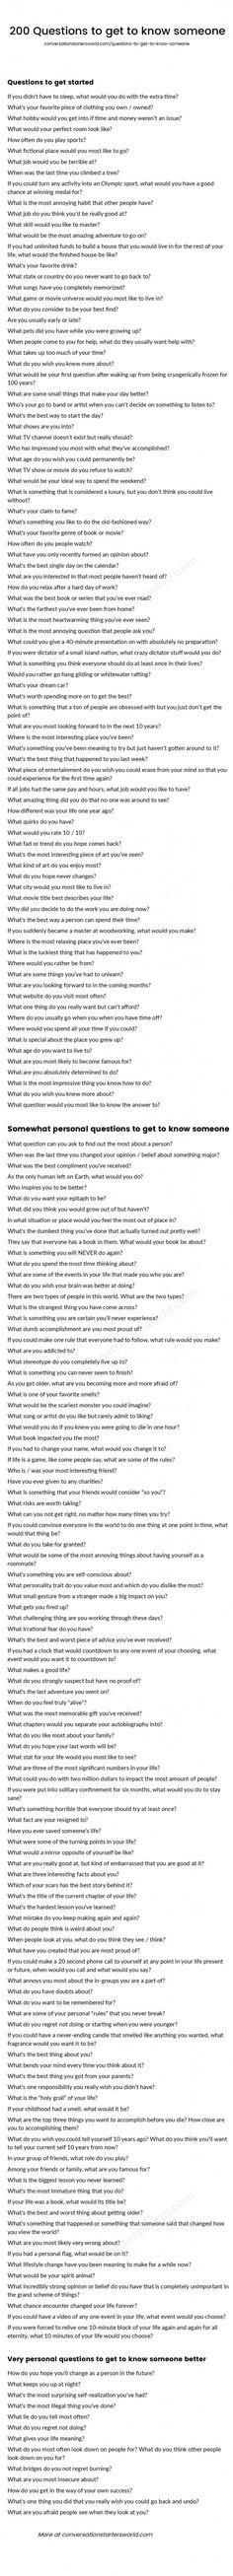 Fragen an den Partner #relationship